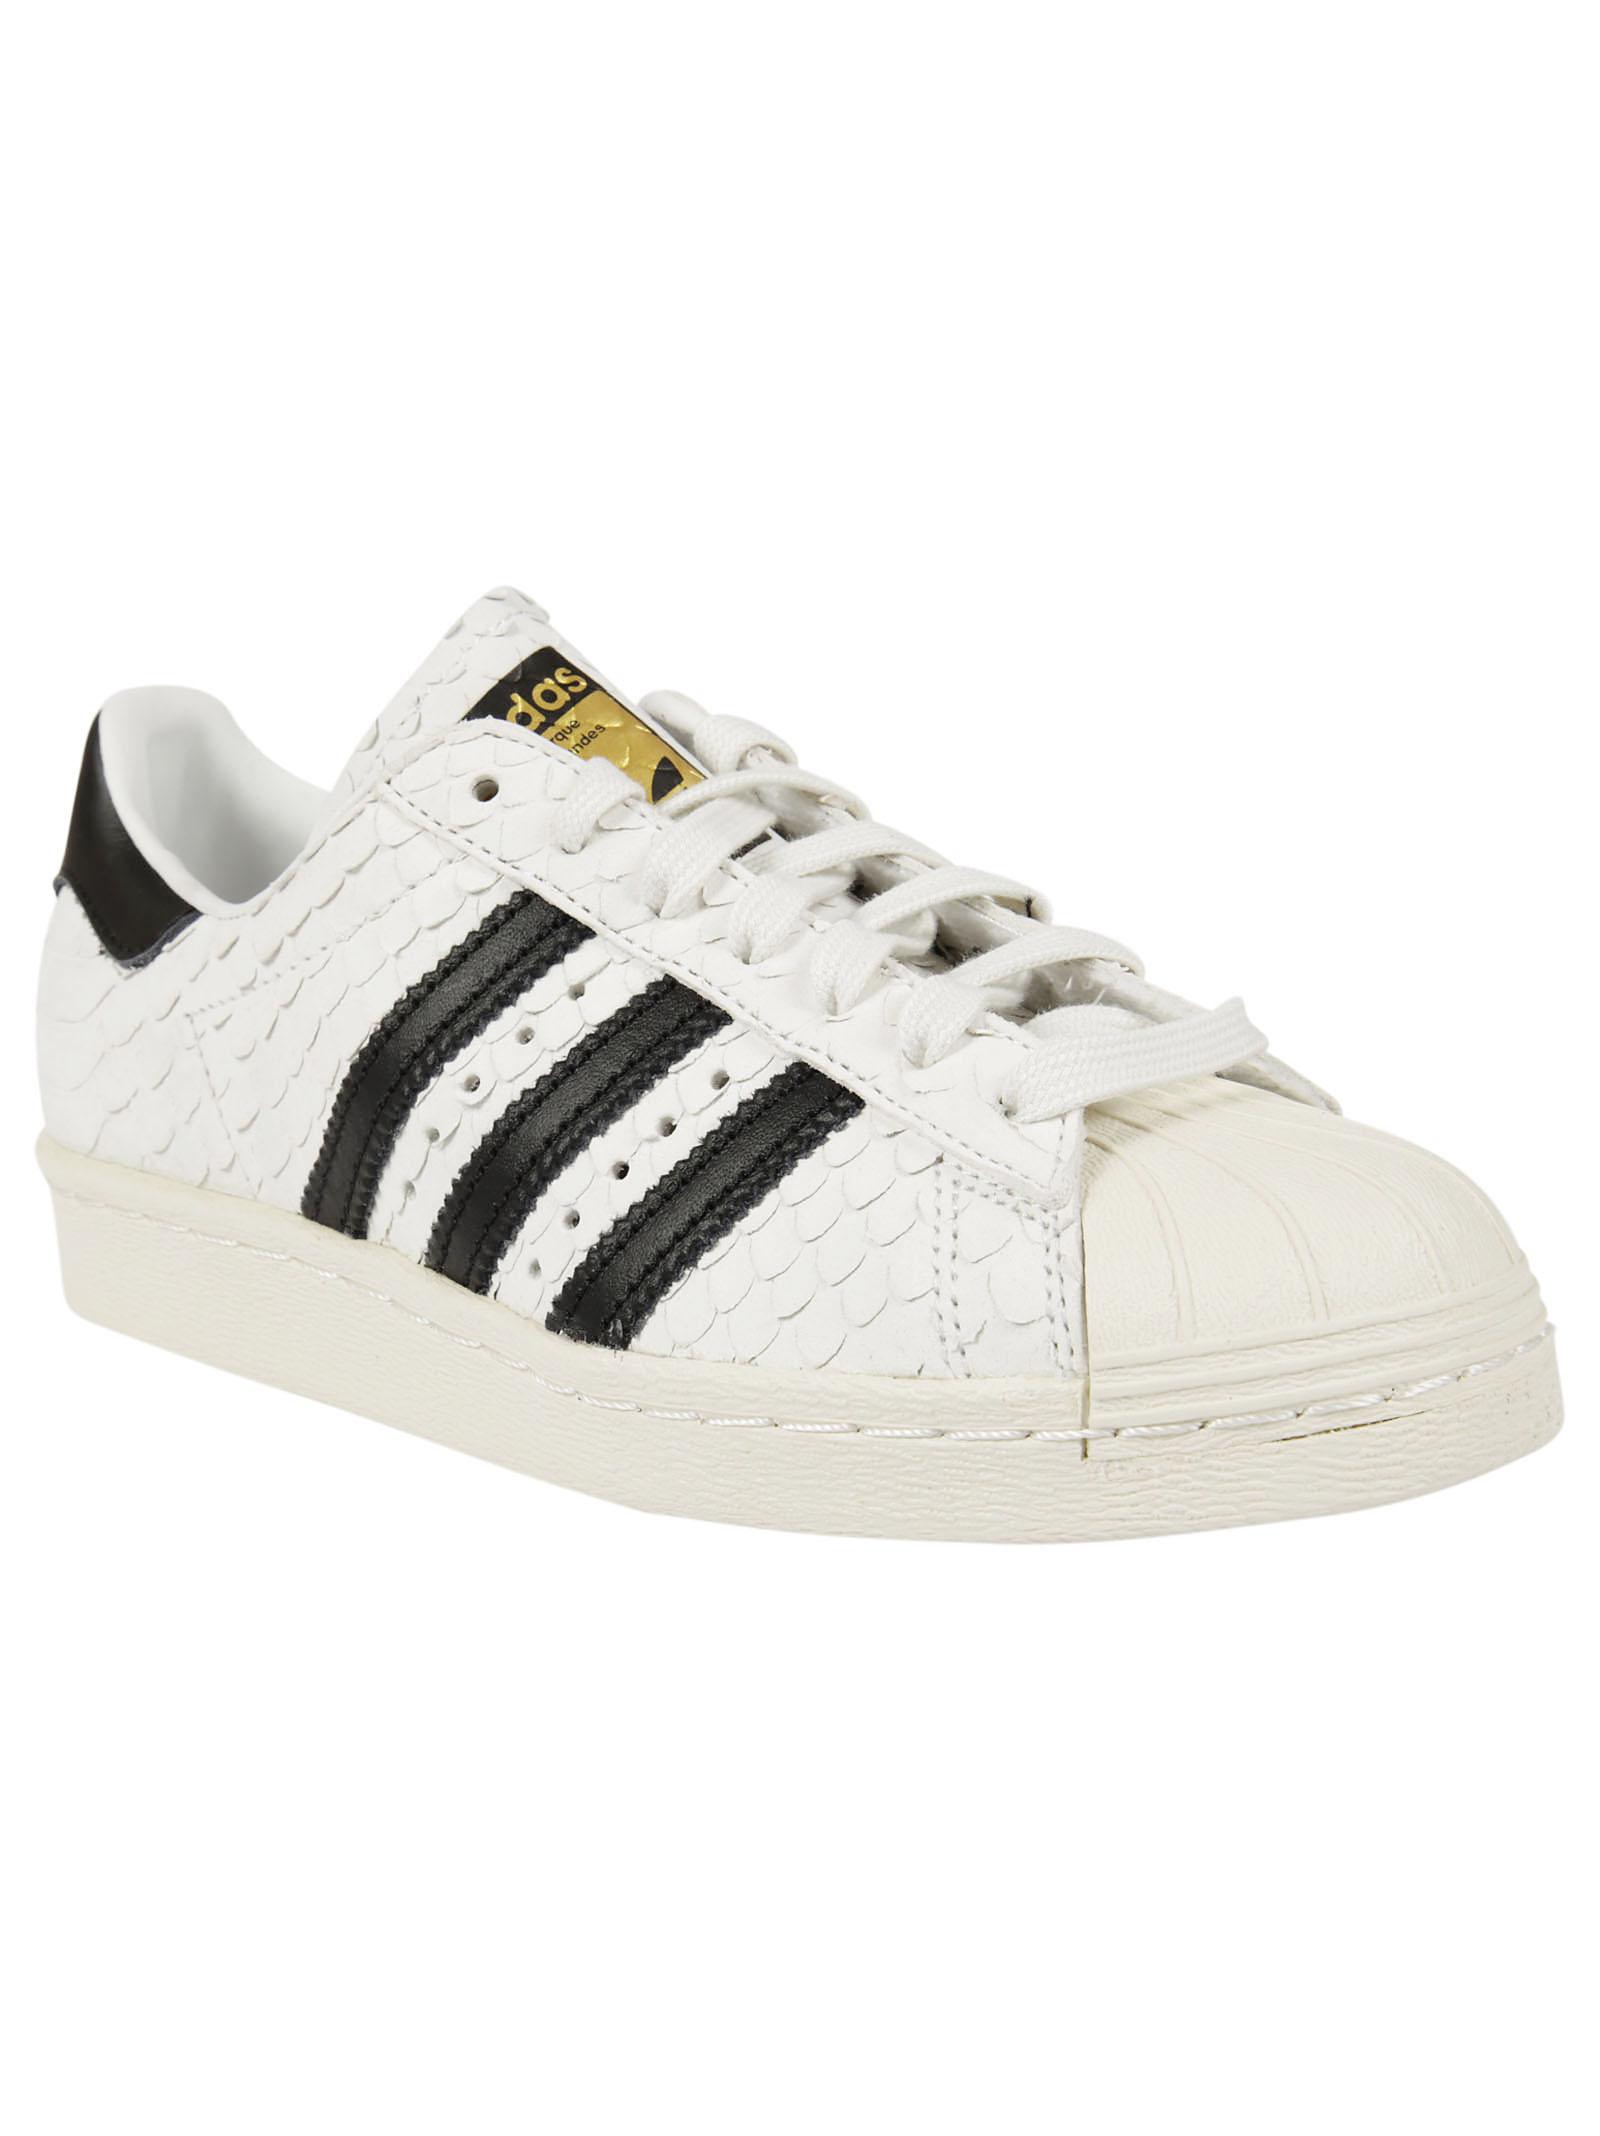 Adidas Adidas Superstar 80s Sneakers